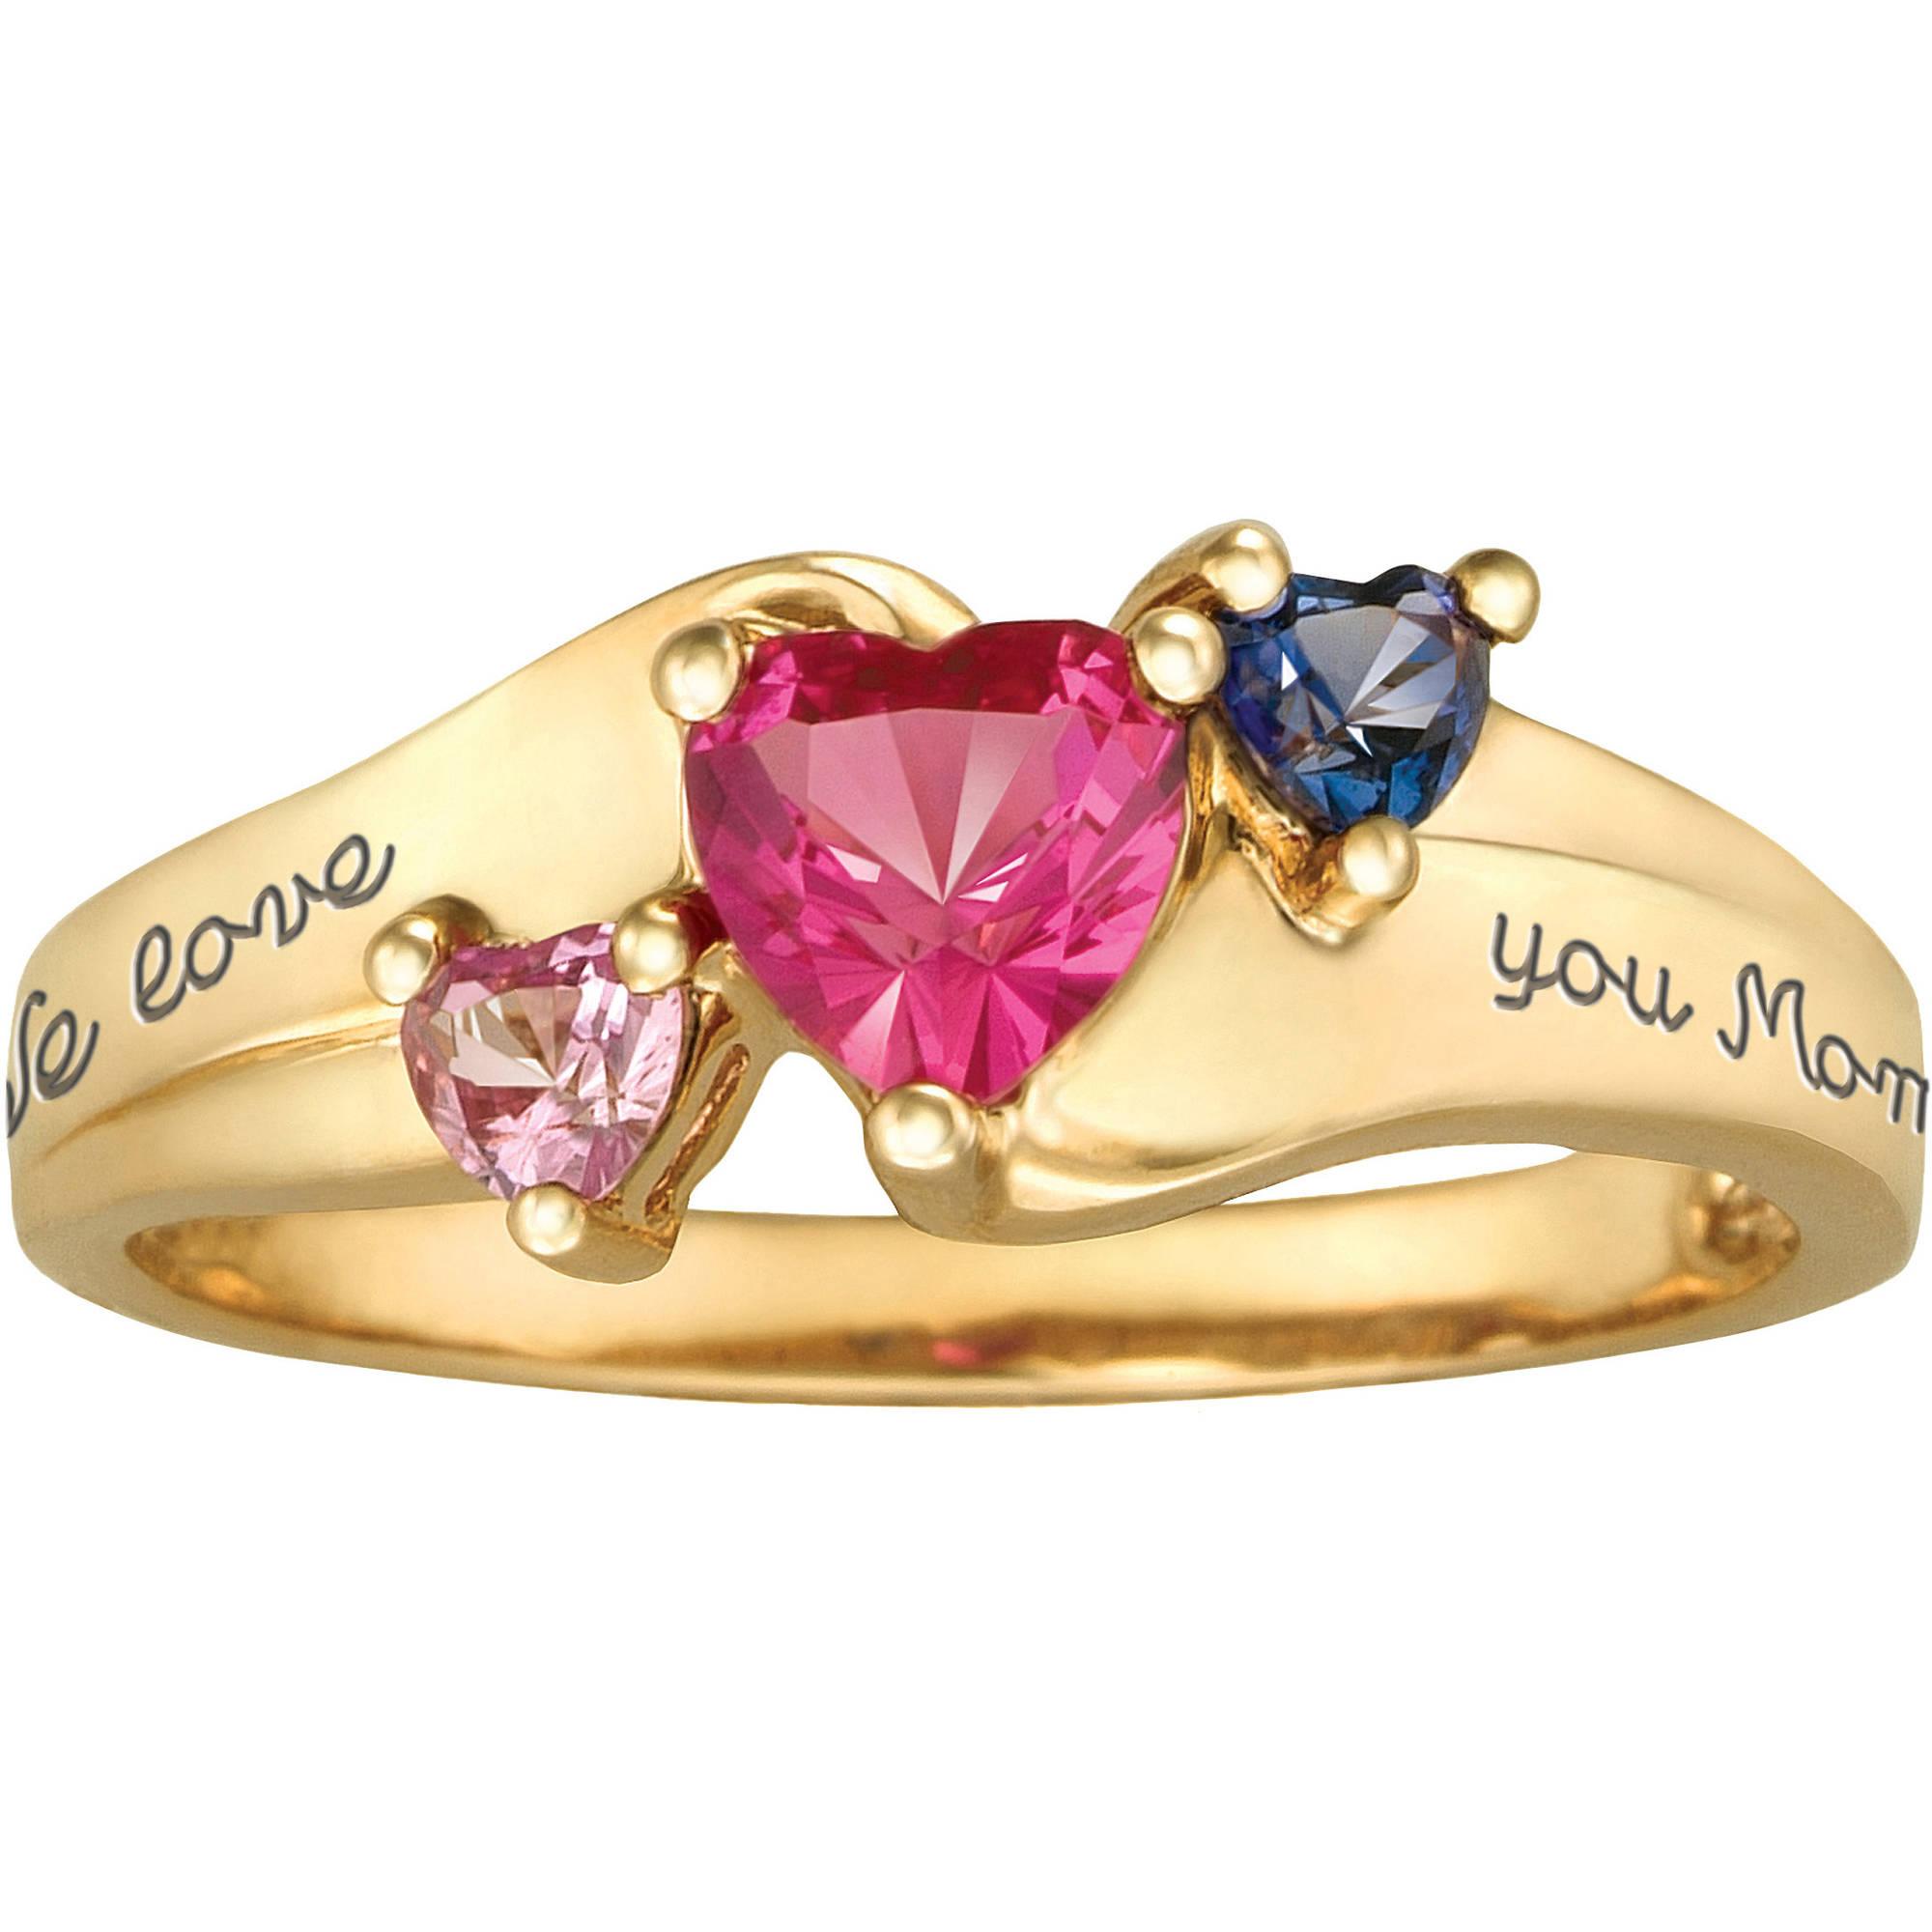 Personalized Keepsake Jewel Ring